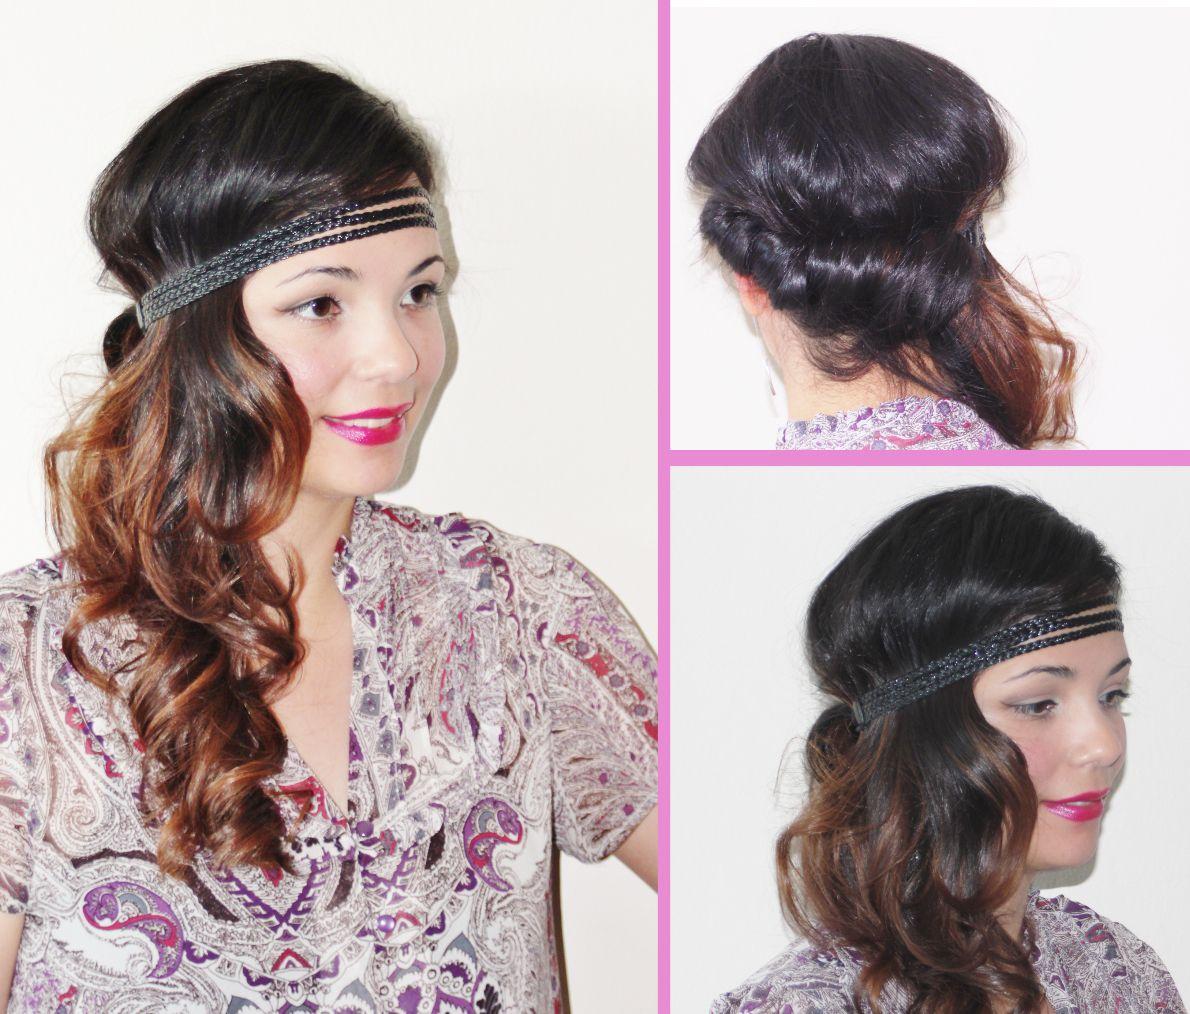 Wavy Side Curls With A Headband!